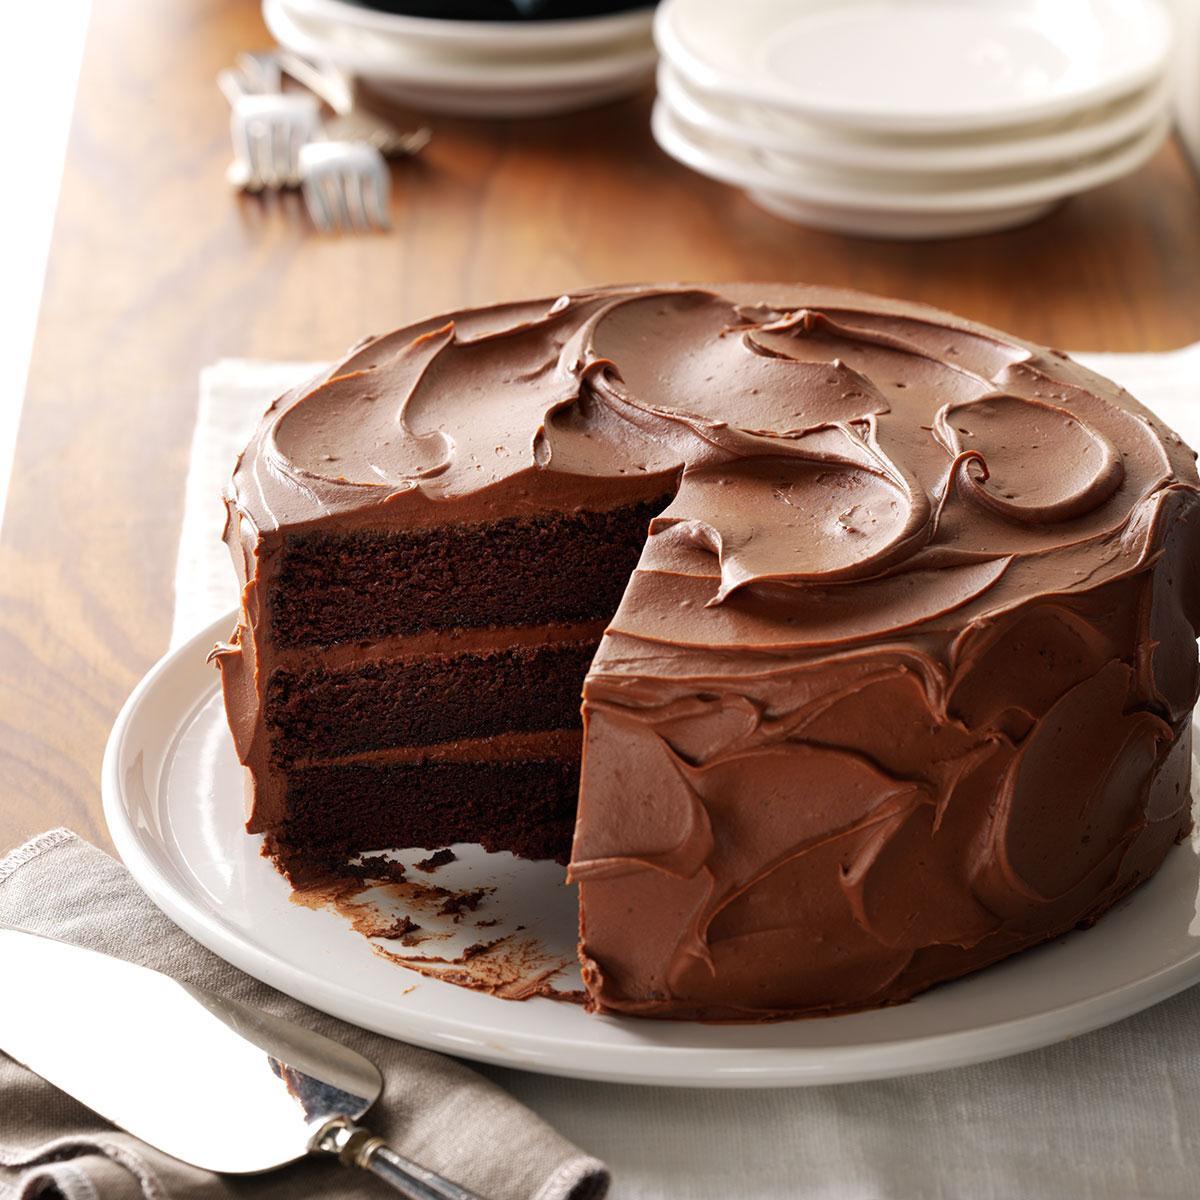 Cake Recipe Ideas  Sandy s Chocolate Cake Recipe